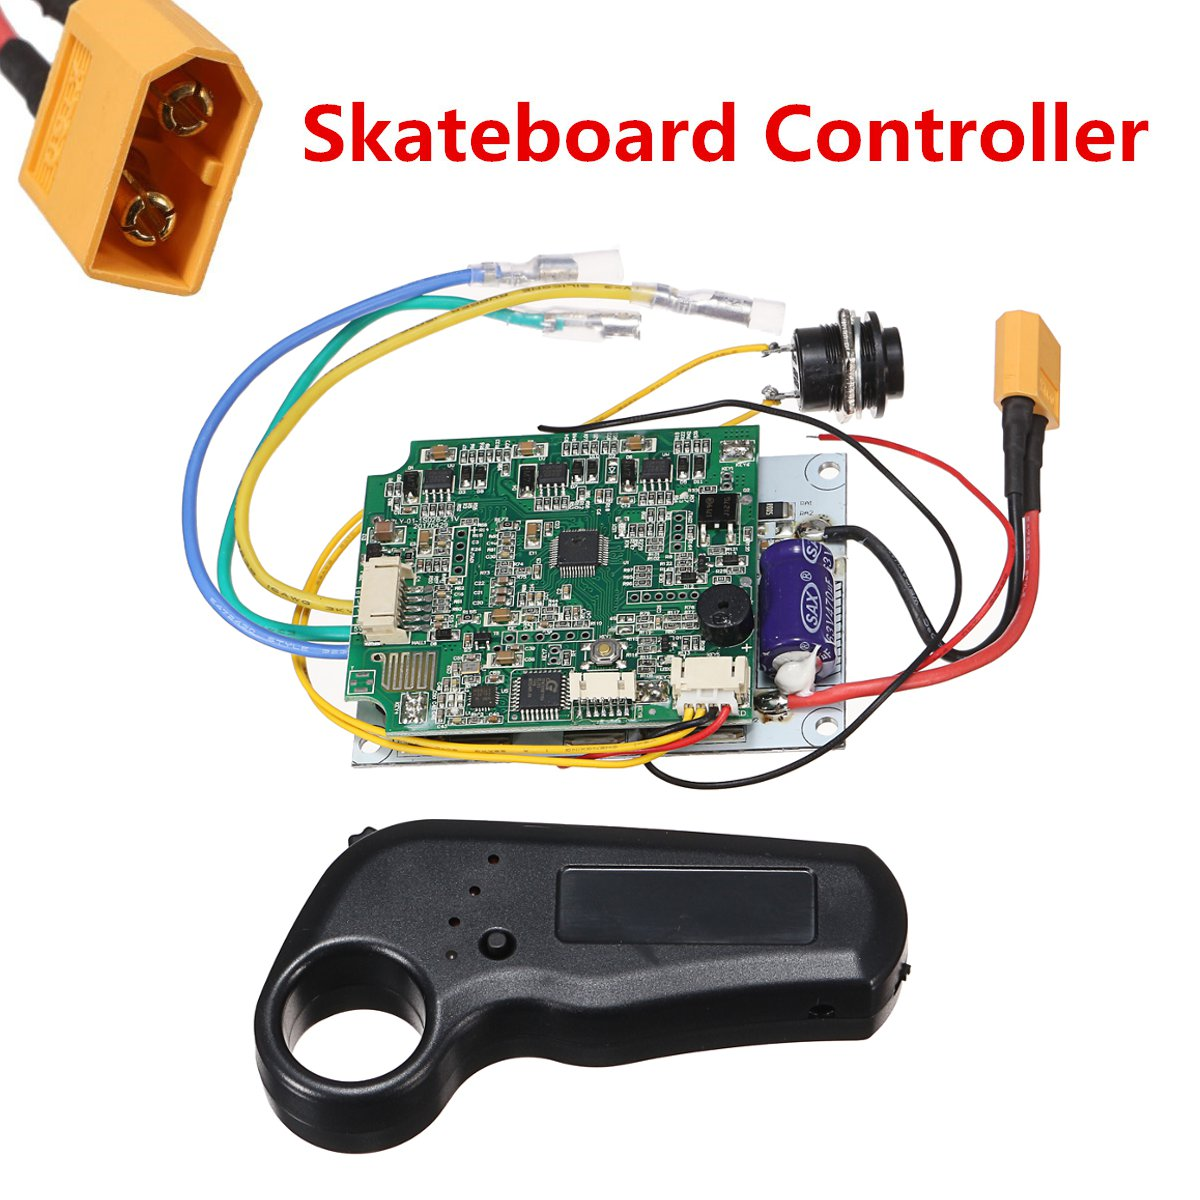 Mini controlador remoto de un solo motor eléctrico de tabla larga de skateboard controlador ESC reemplazo de monopatín eléctrico longboard